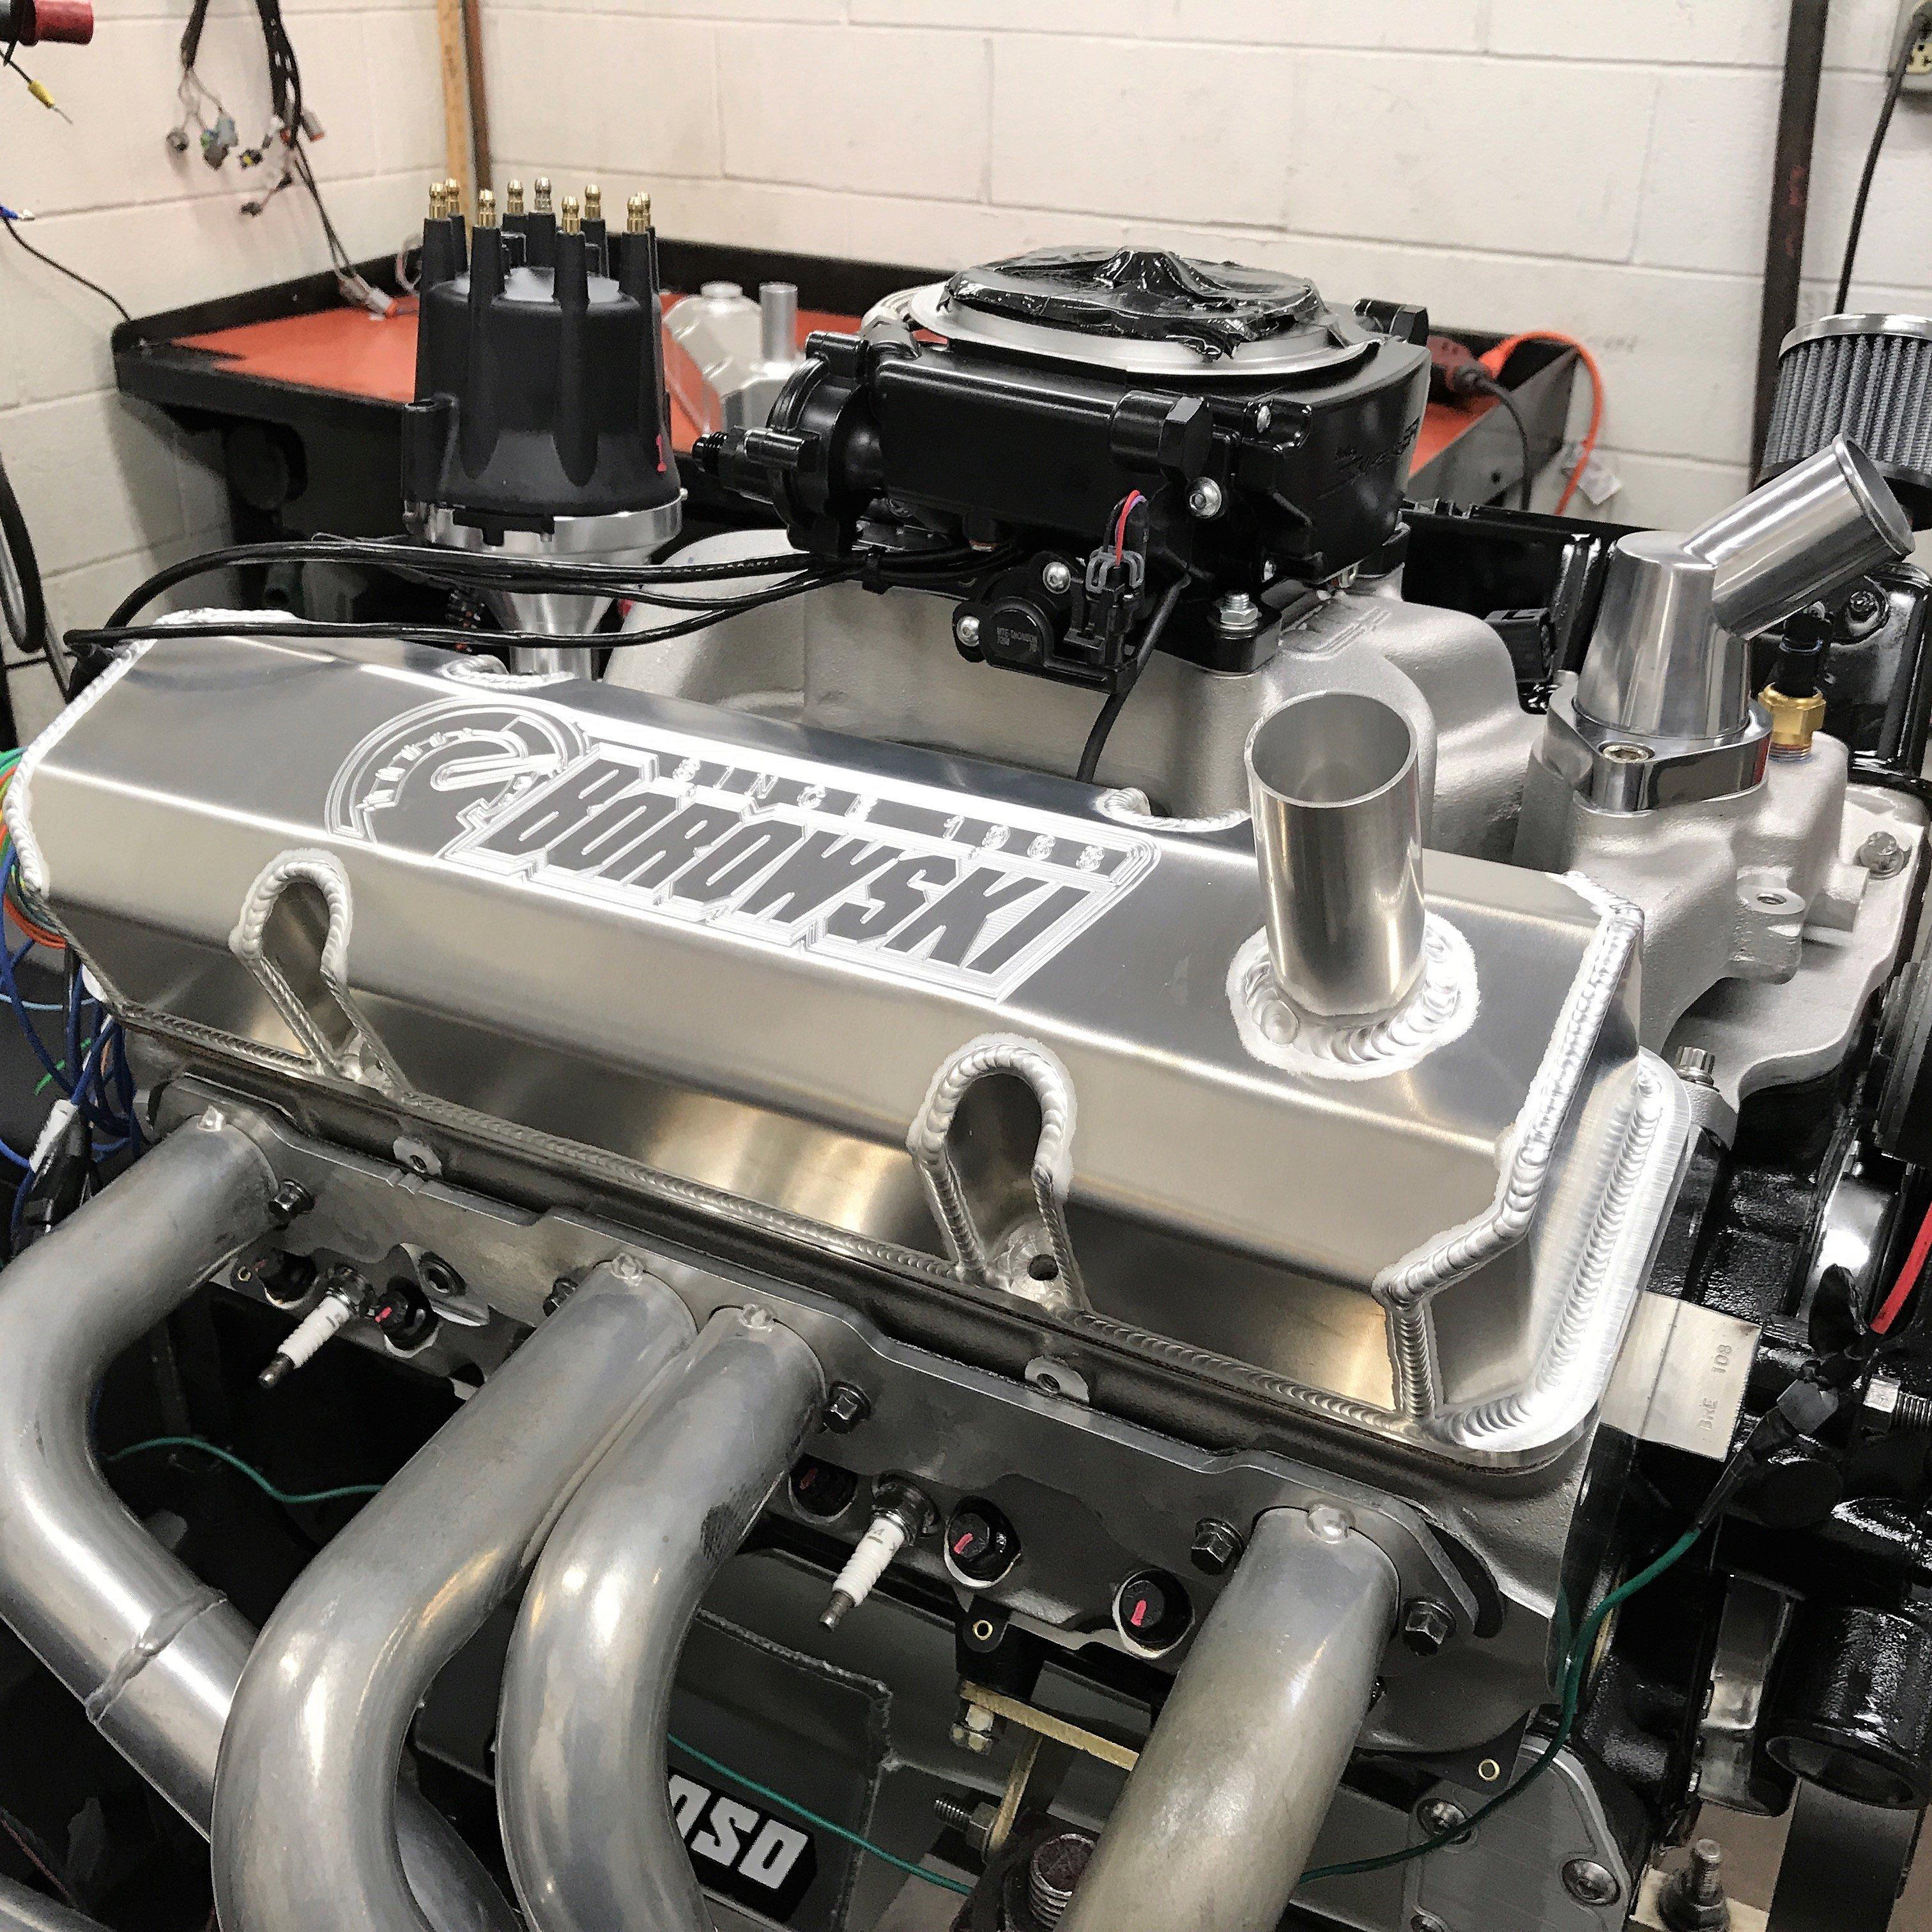 OM_1236] 327 Chevy Engine Diagram Car Tuning Schematic WiringIfica Grebs Sospe Oupli Over Benkeme Rine Umize Ponge Mohammedshrine Librar  Wiring 101